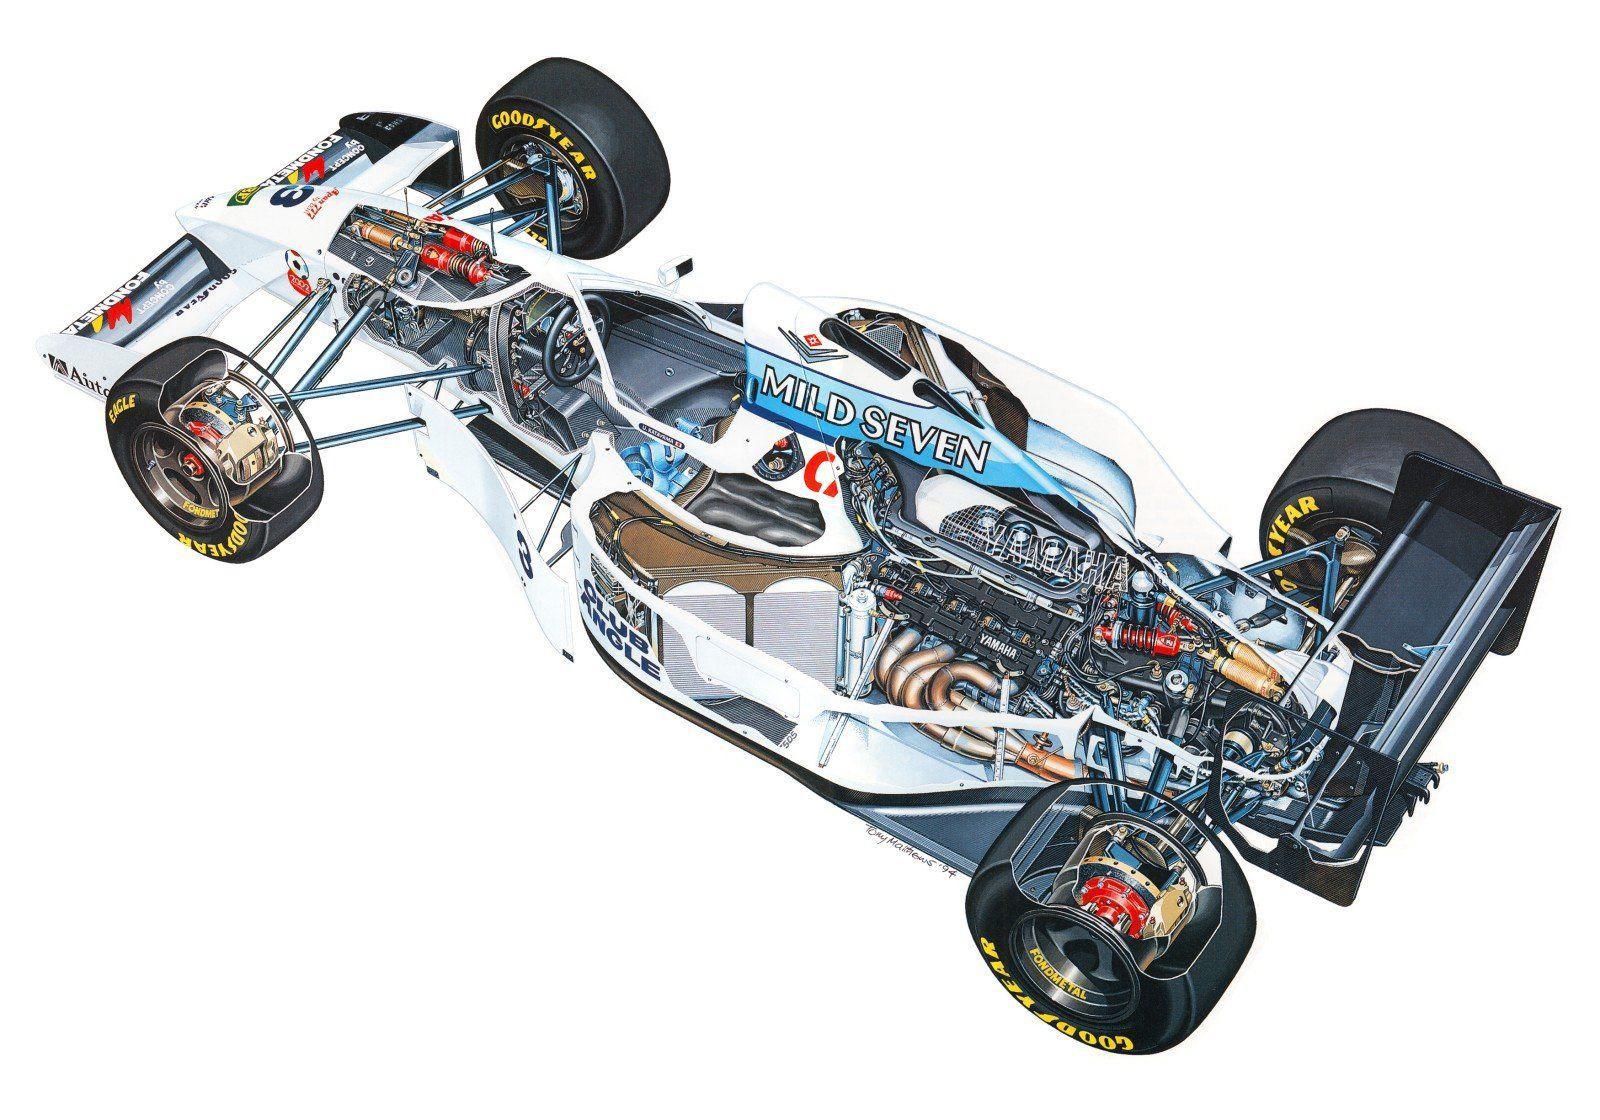 Tyrrell 022 cutaway drawing